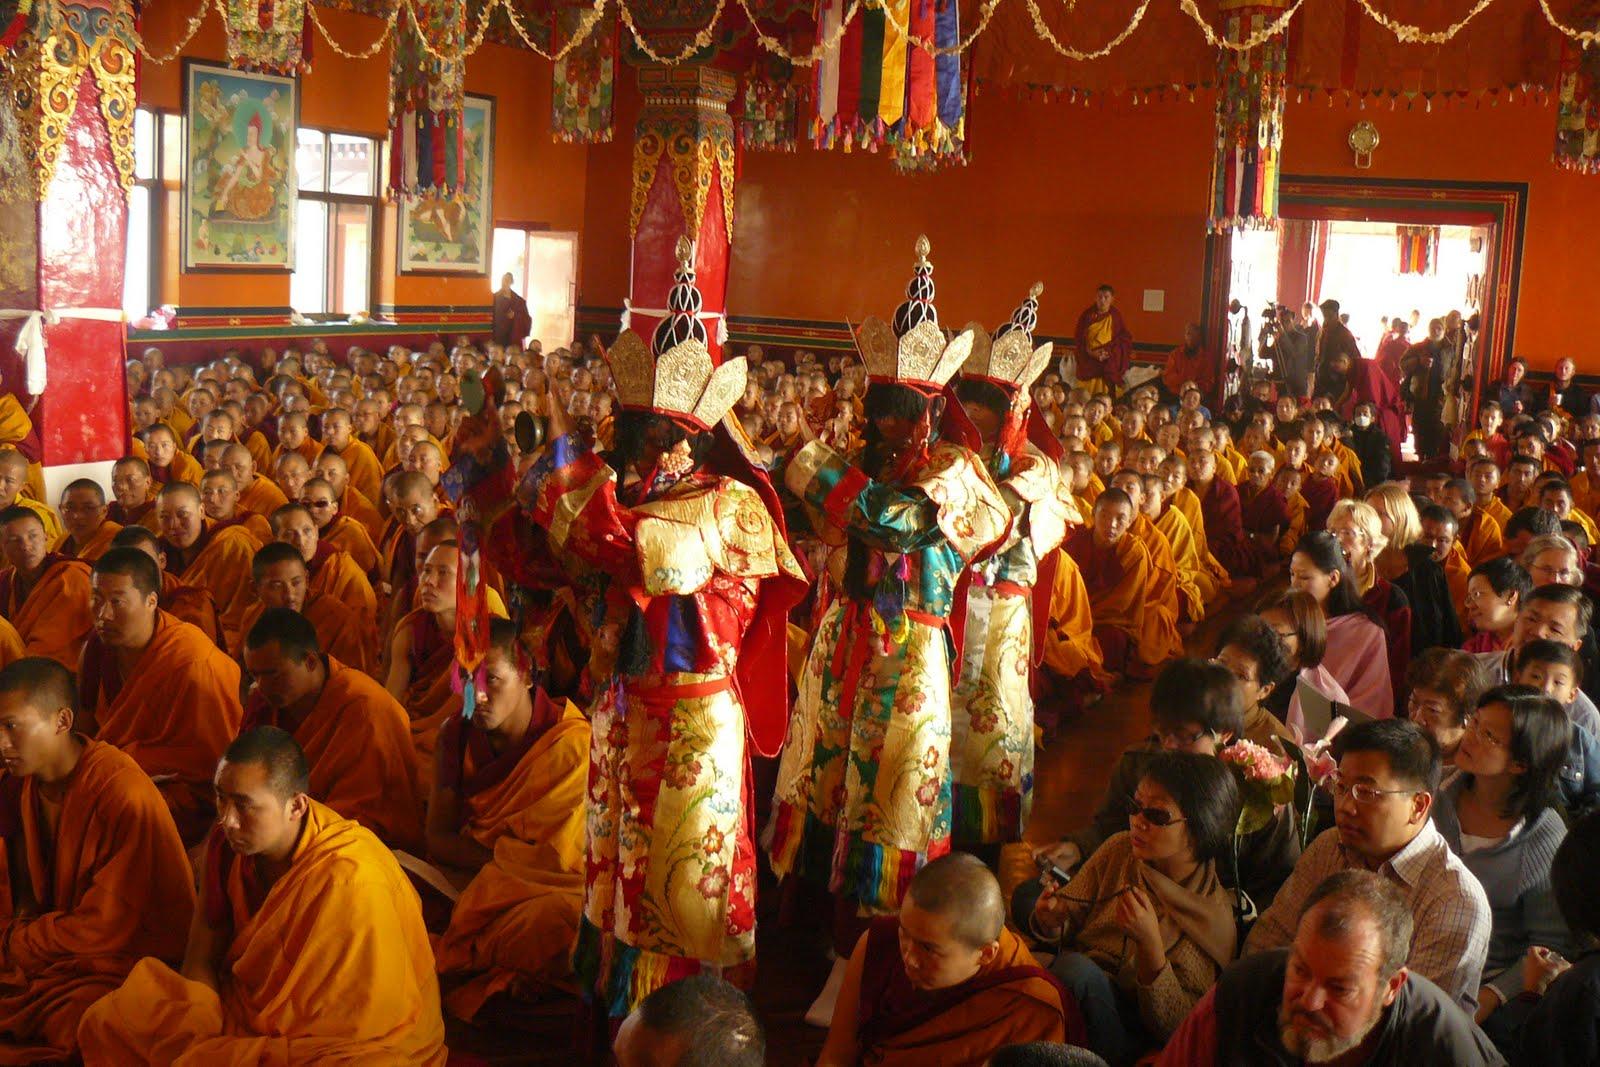 Dakinis enter long life puja for Lama Zopa Rinpoche, Kopan Monastery December, 2008.